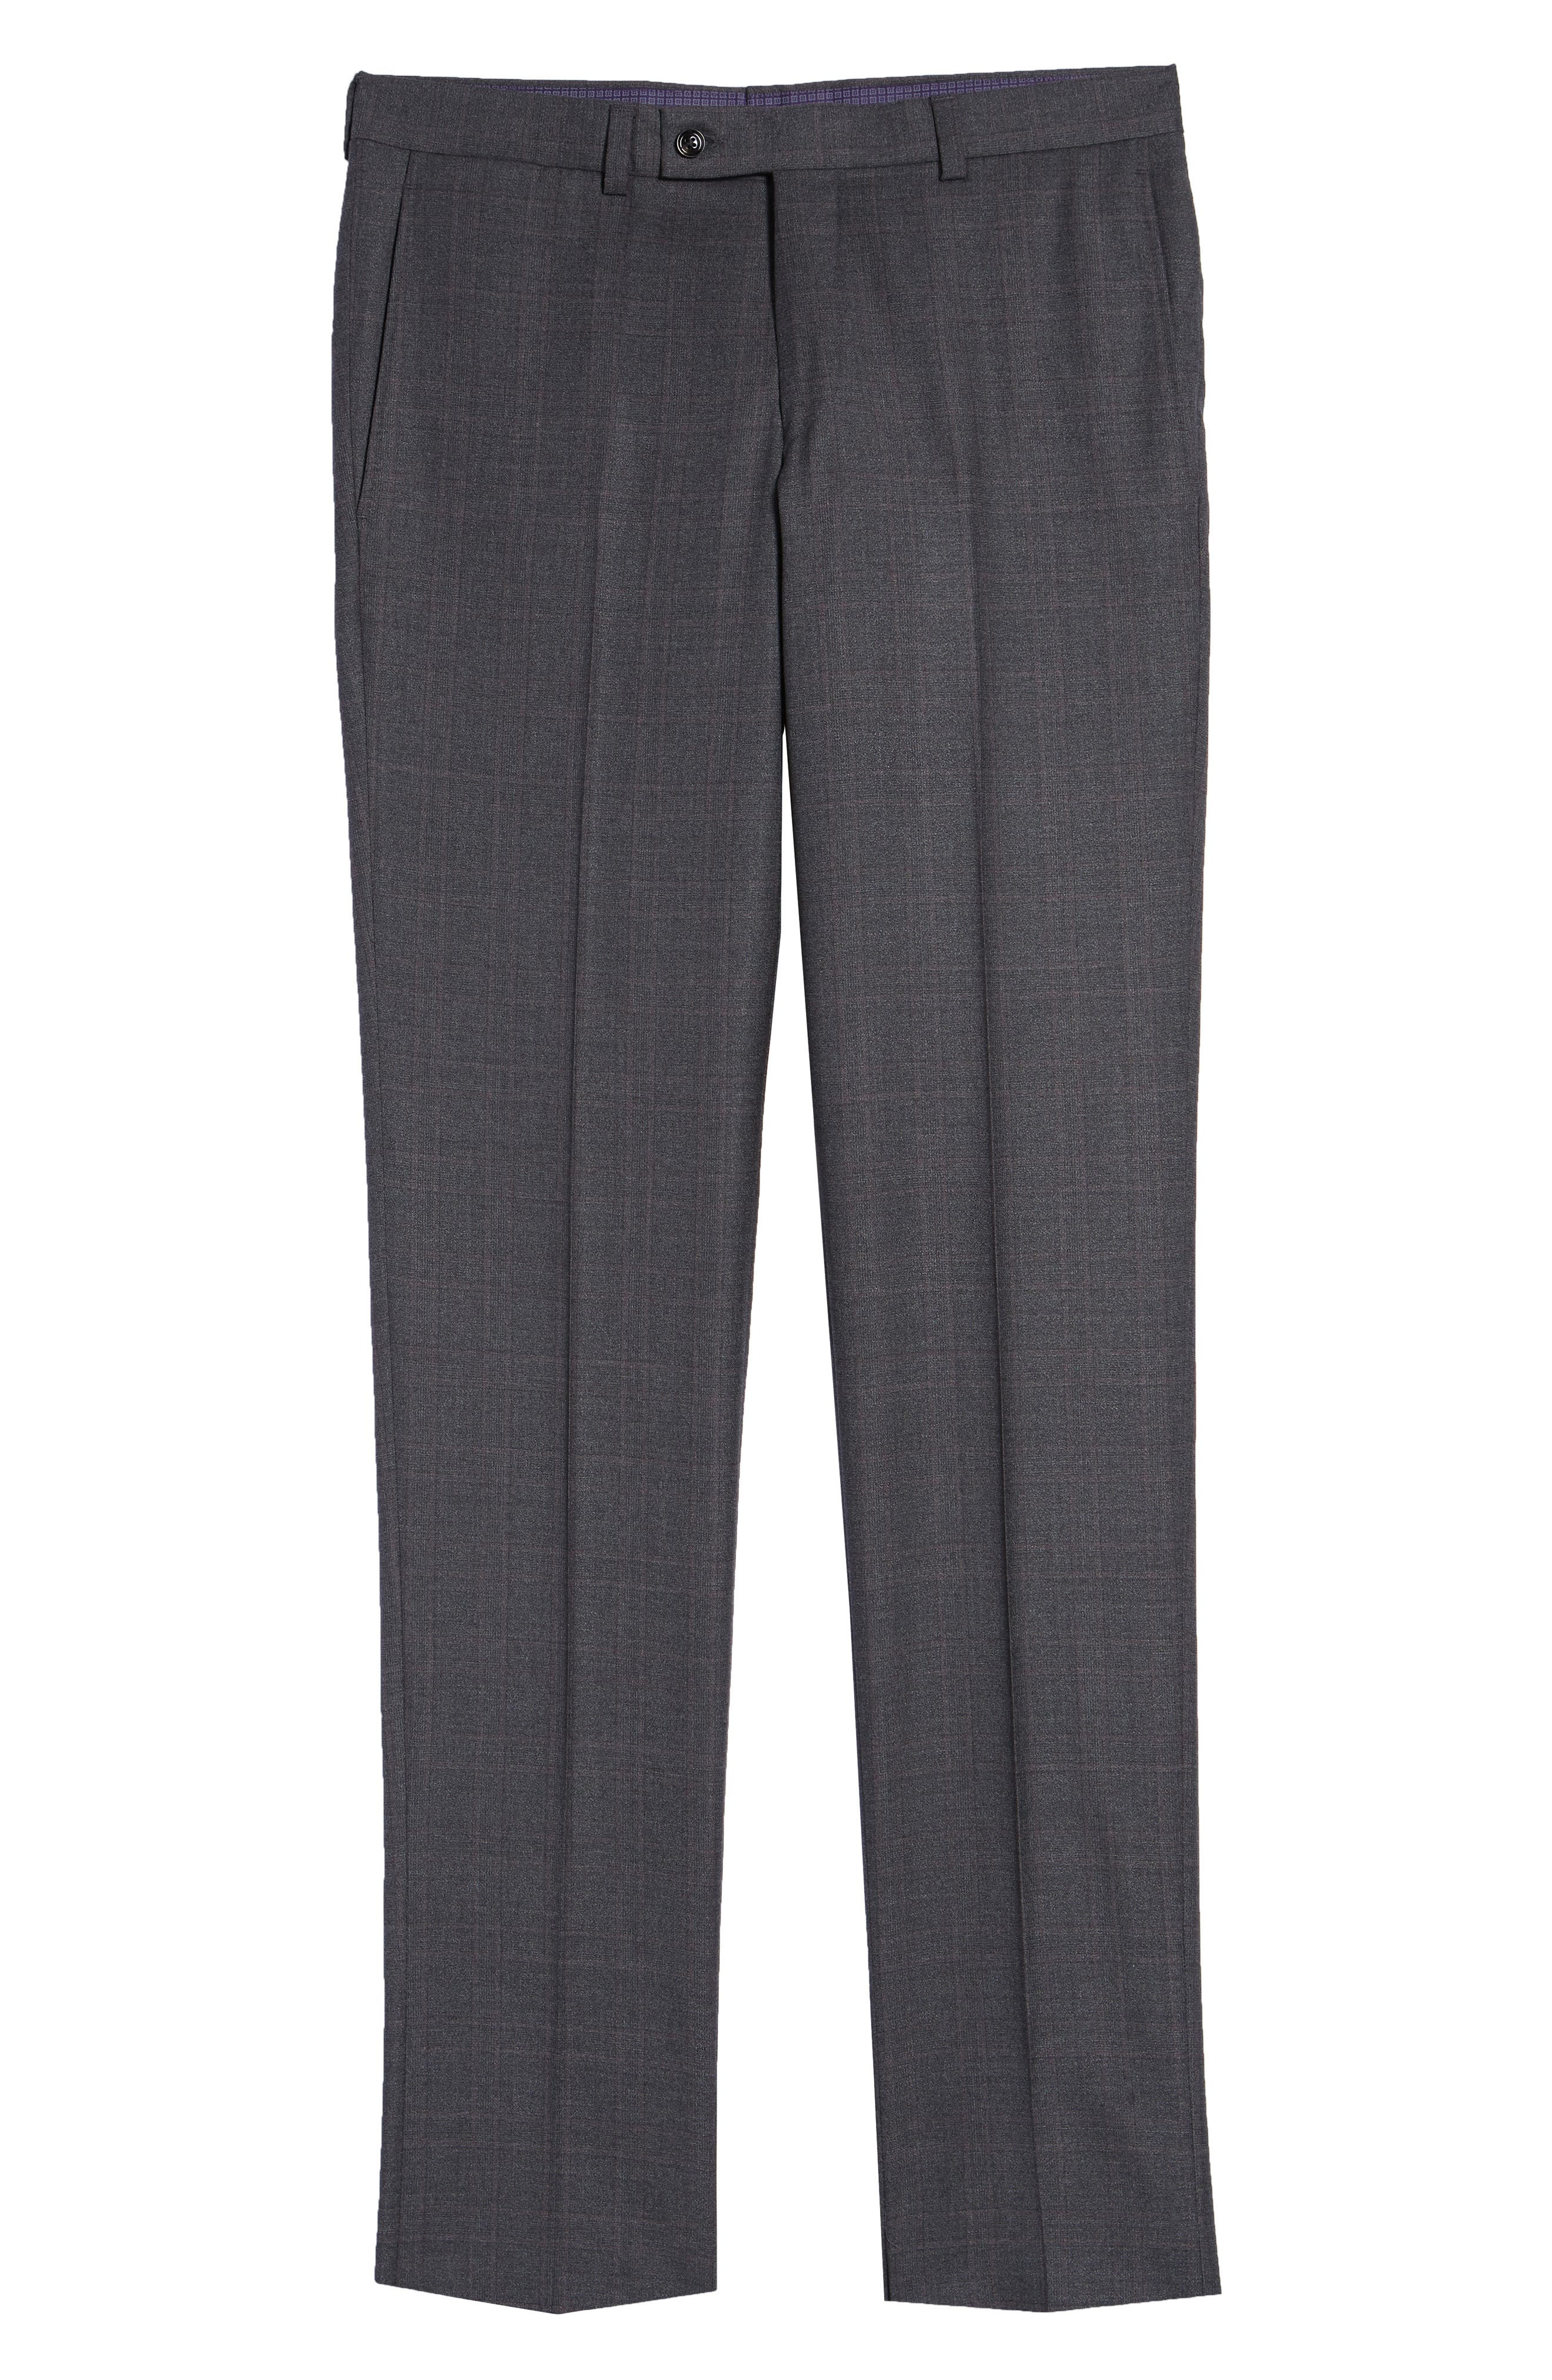 Jefferson Flat Front Plaid Wool Trousers,                             Alternate thumbnail 6, color,                             GREY